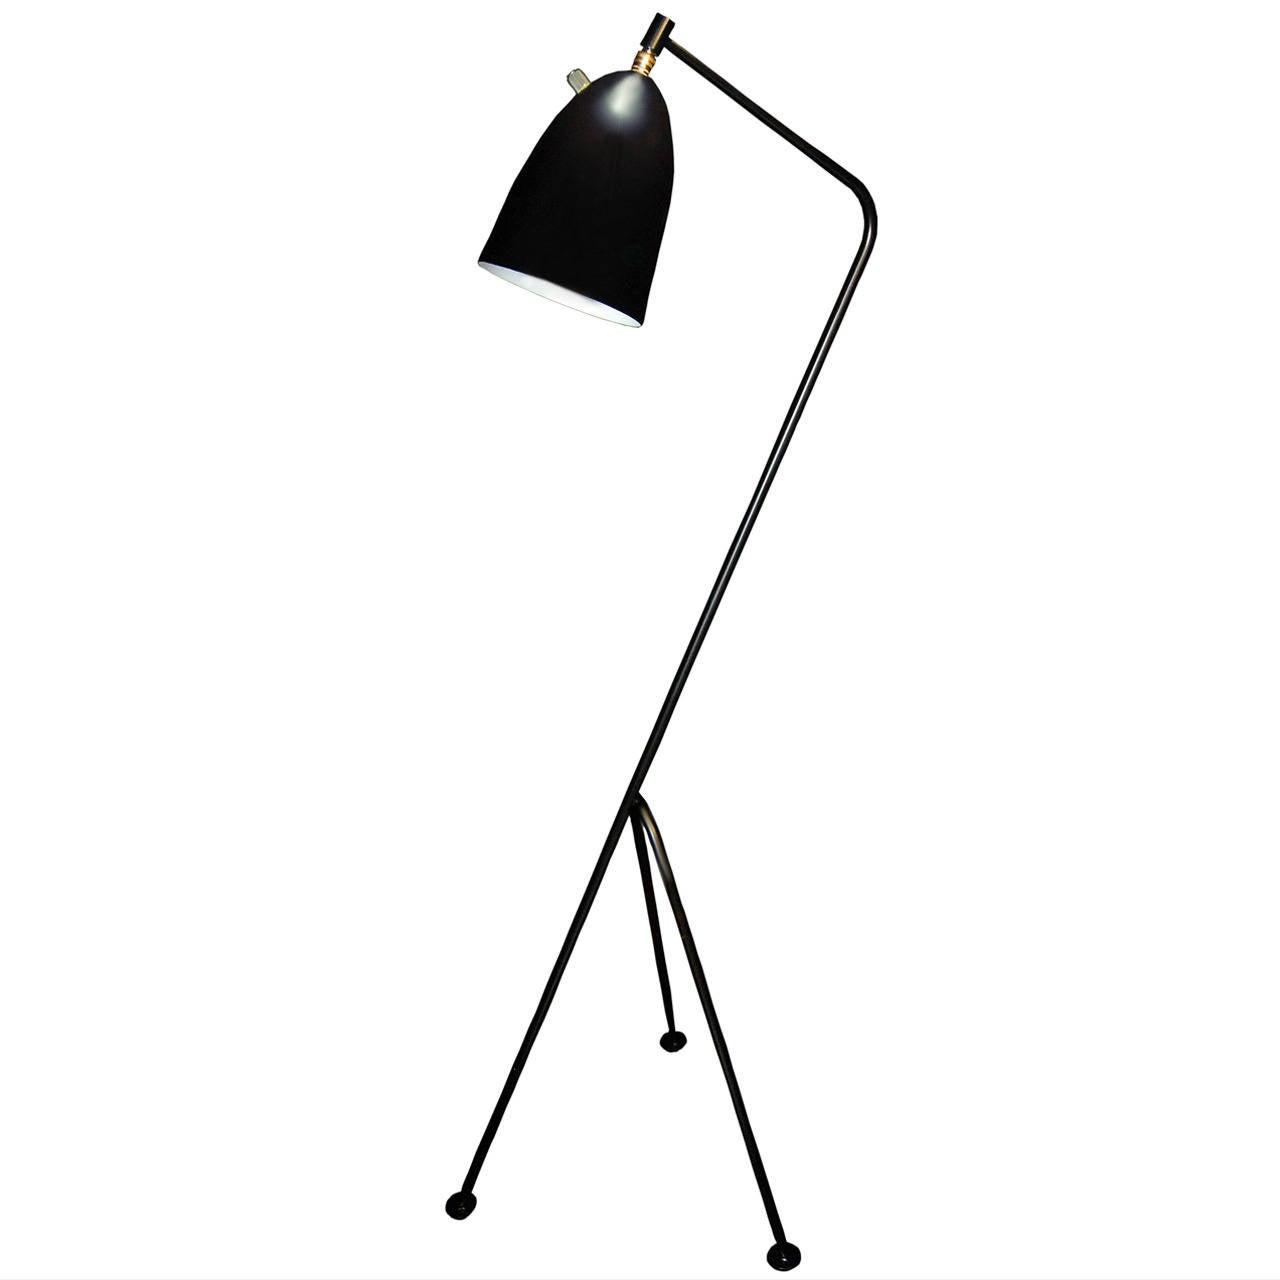 greta grossman style grasshopper floor lamp at 1stdibs. Black Bedroom Furniture Sets. Home Design Ideas